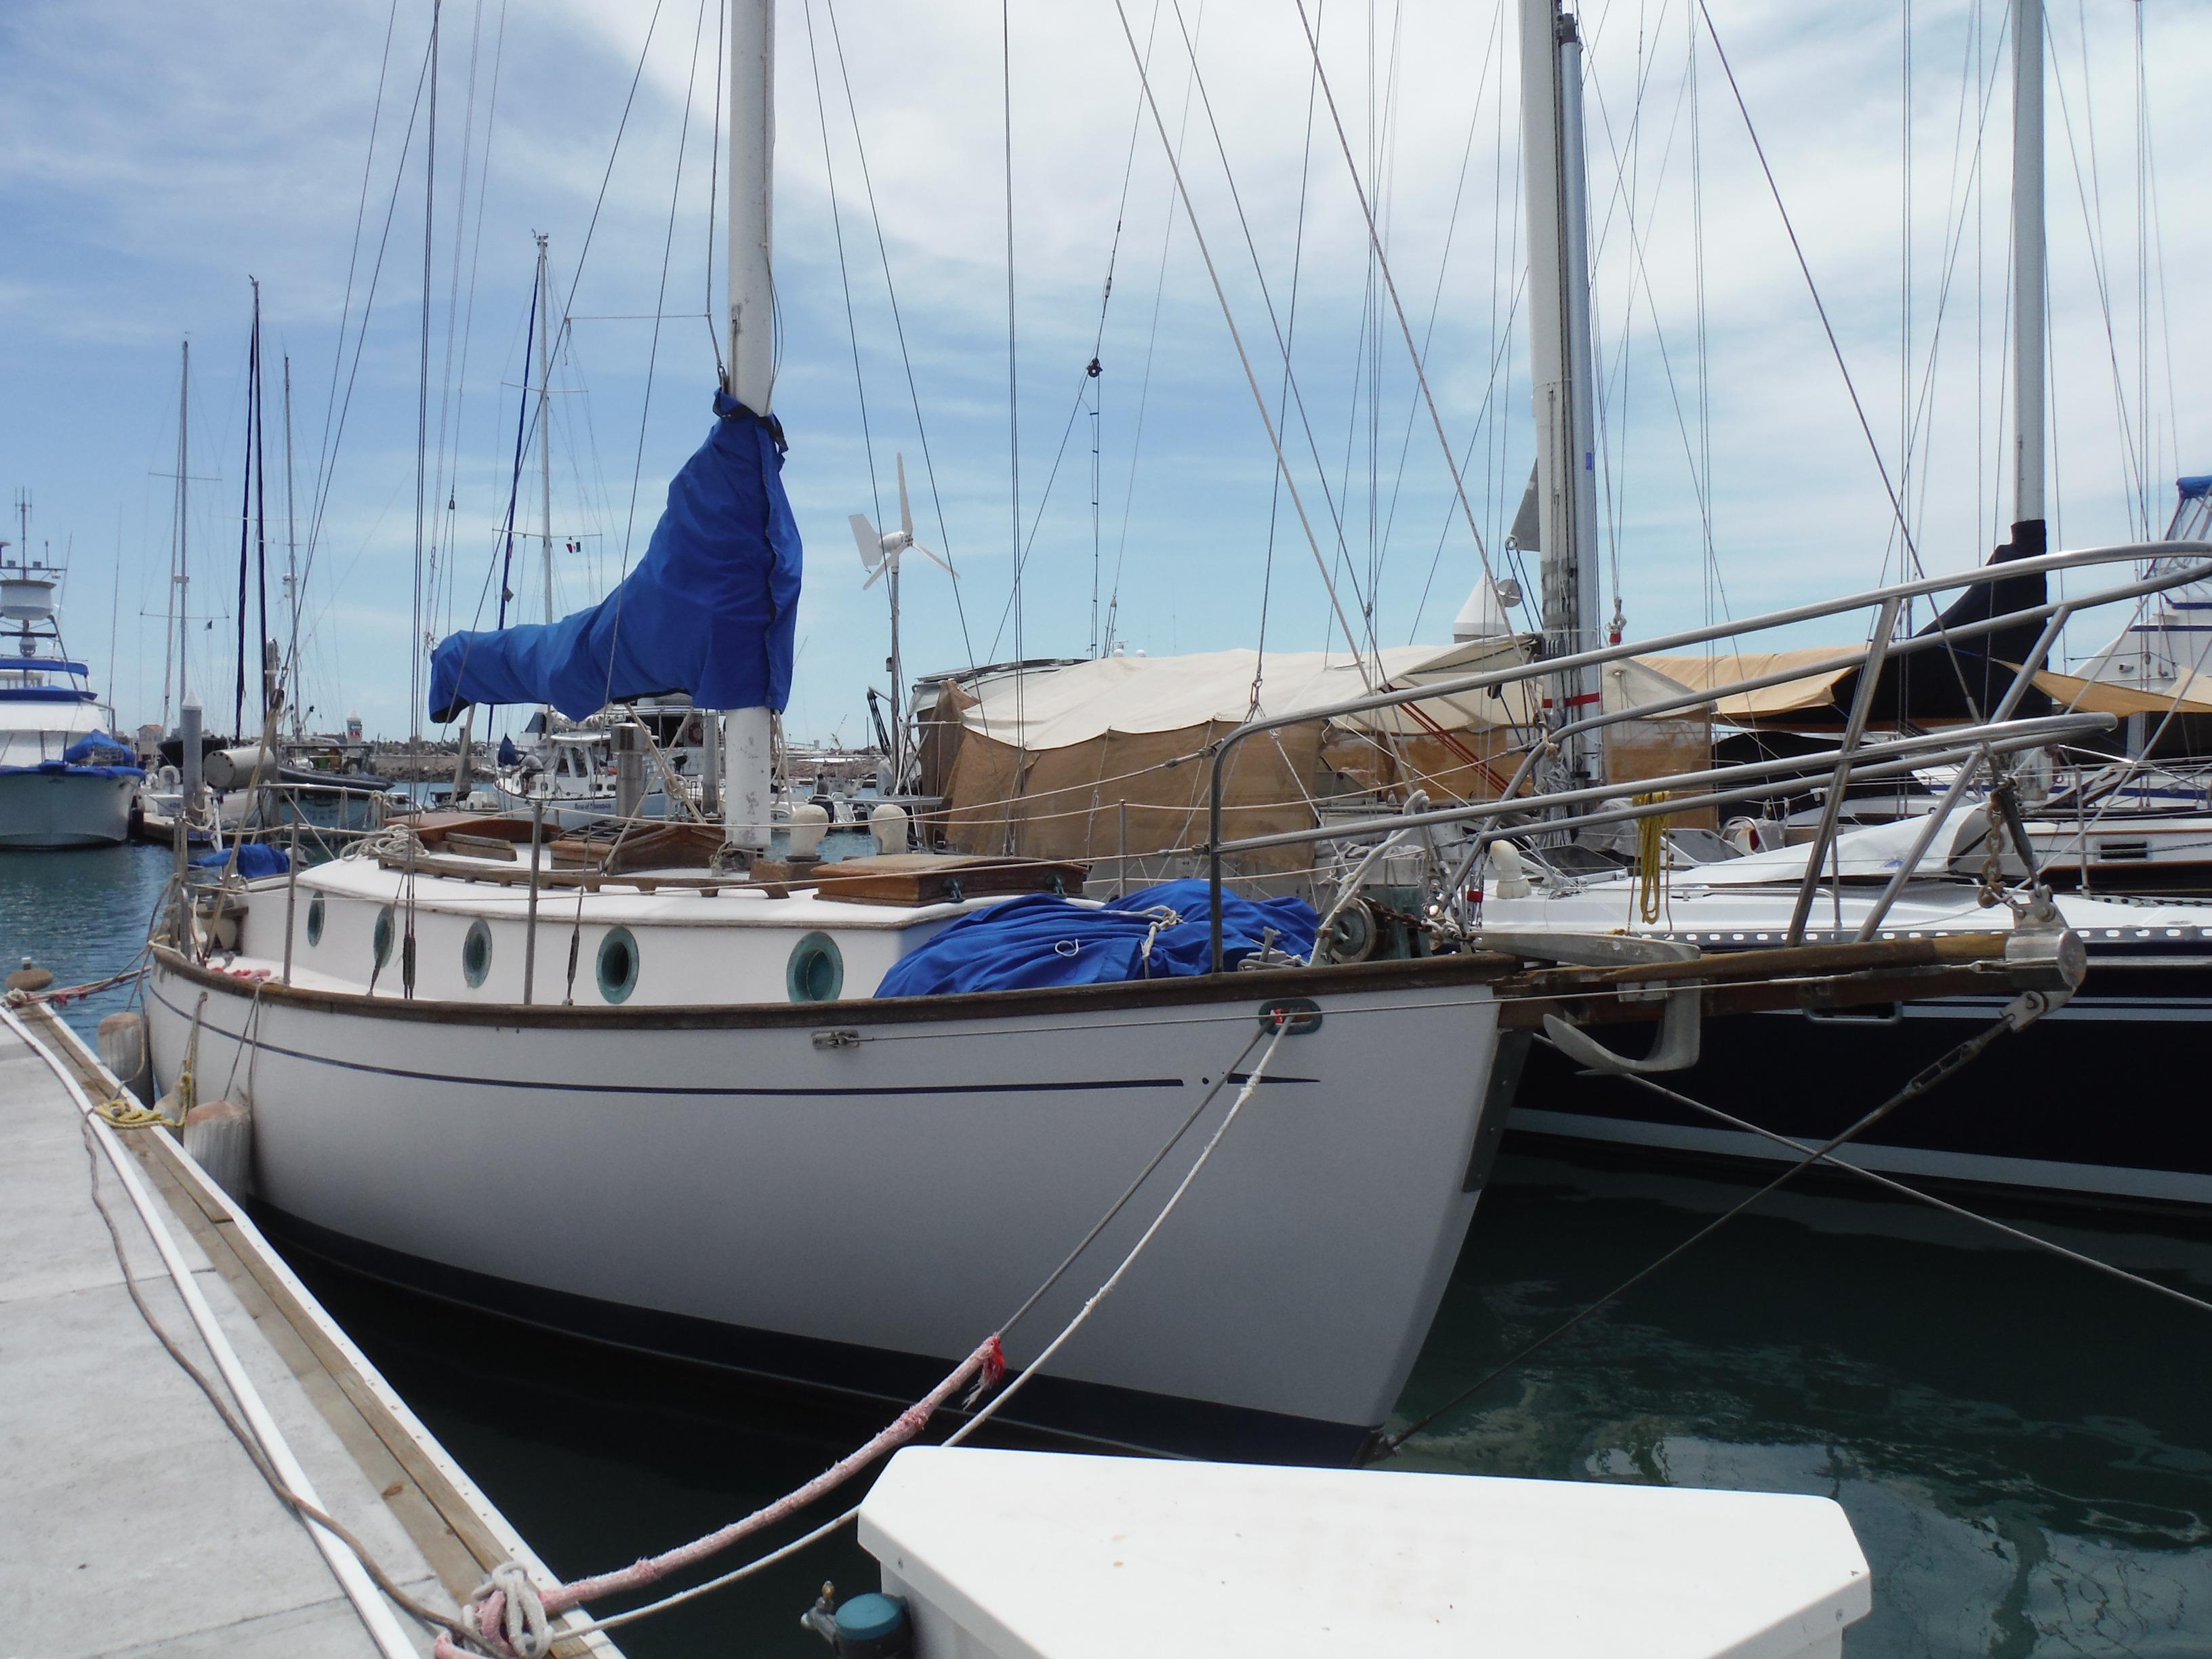 34' Noon Ocean 34 Cutter+Boat for sale!